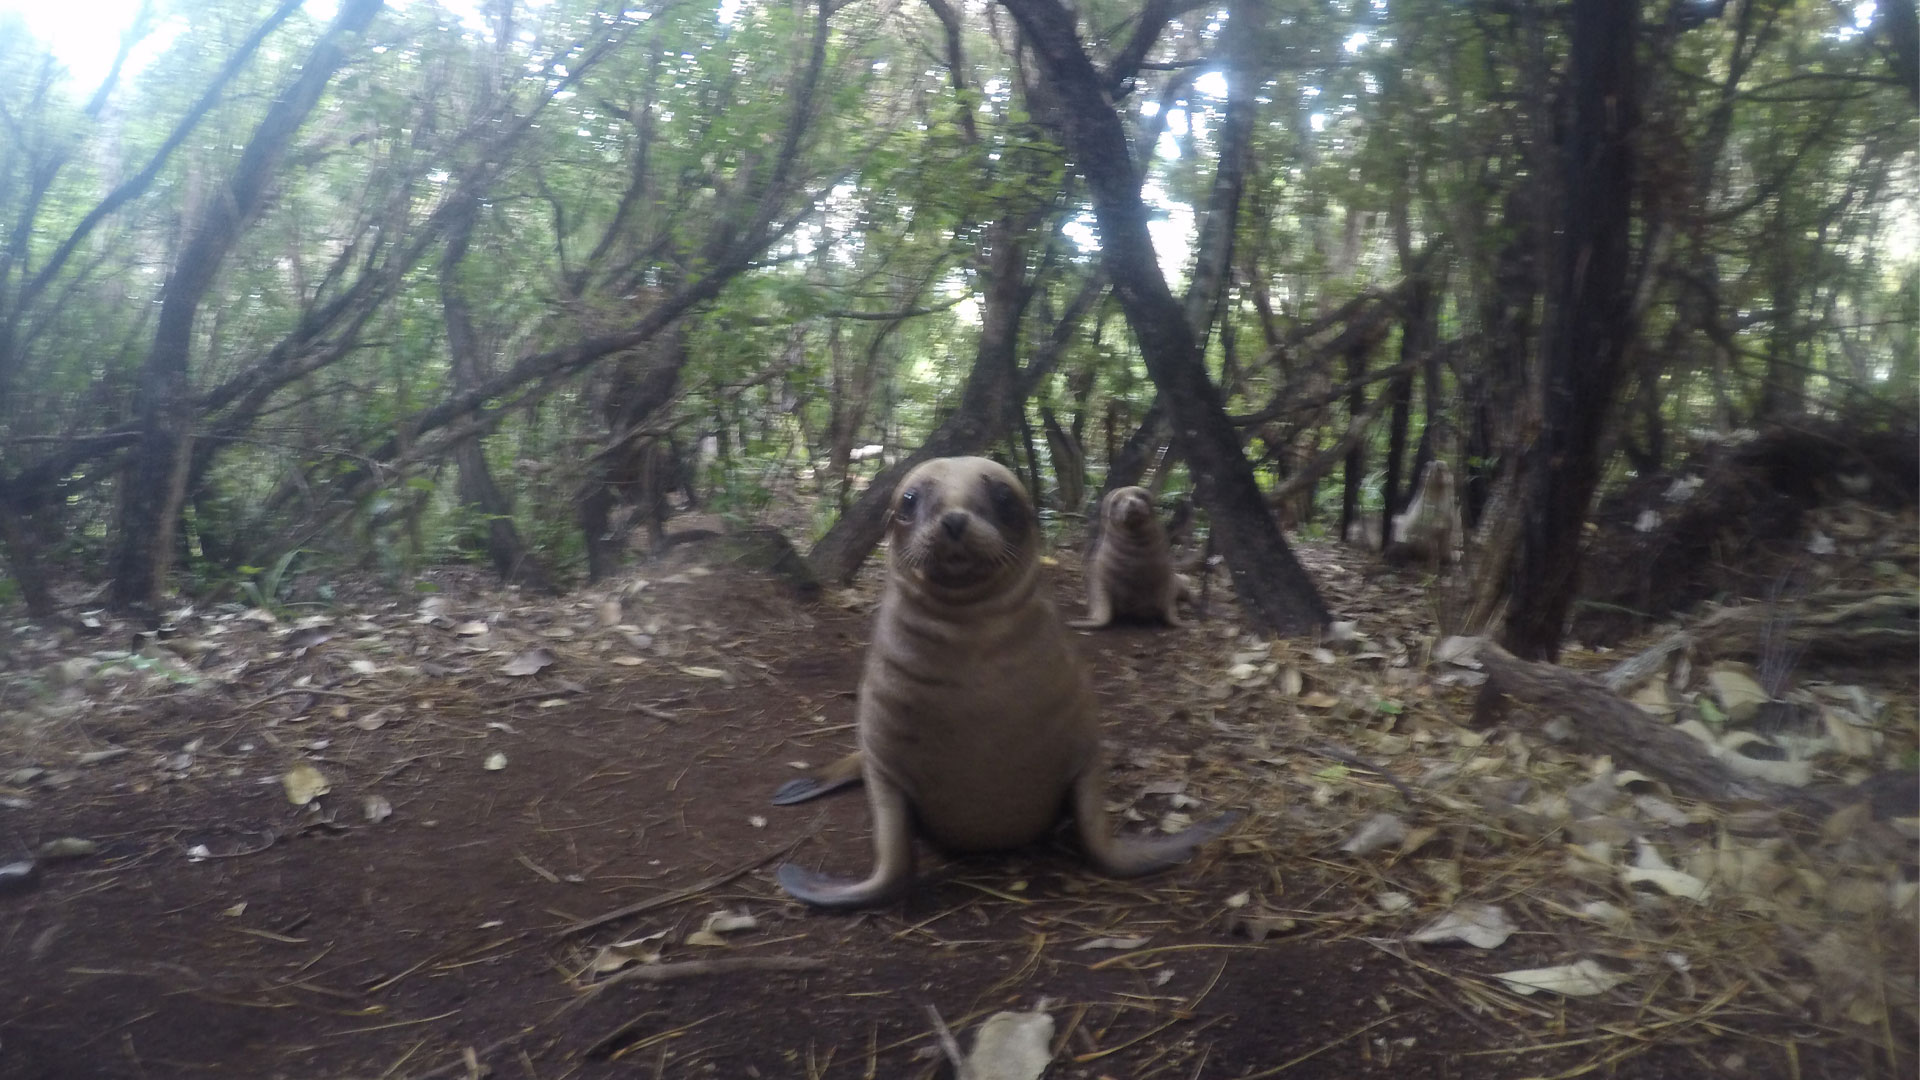 https://rfacdn.nz/zoo/assets/media/sea-lion-conservation-gallery-3.jpg